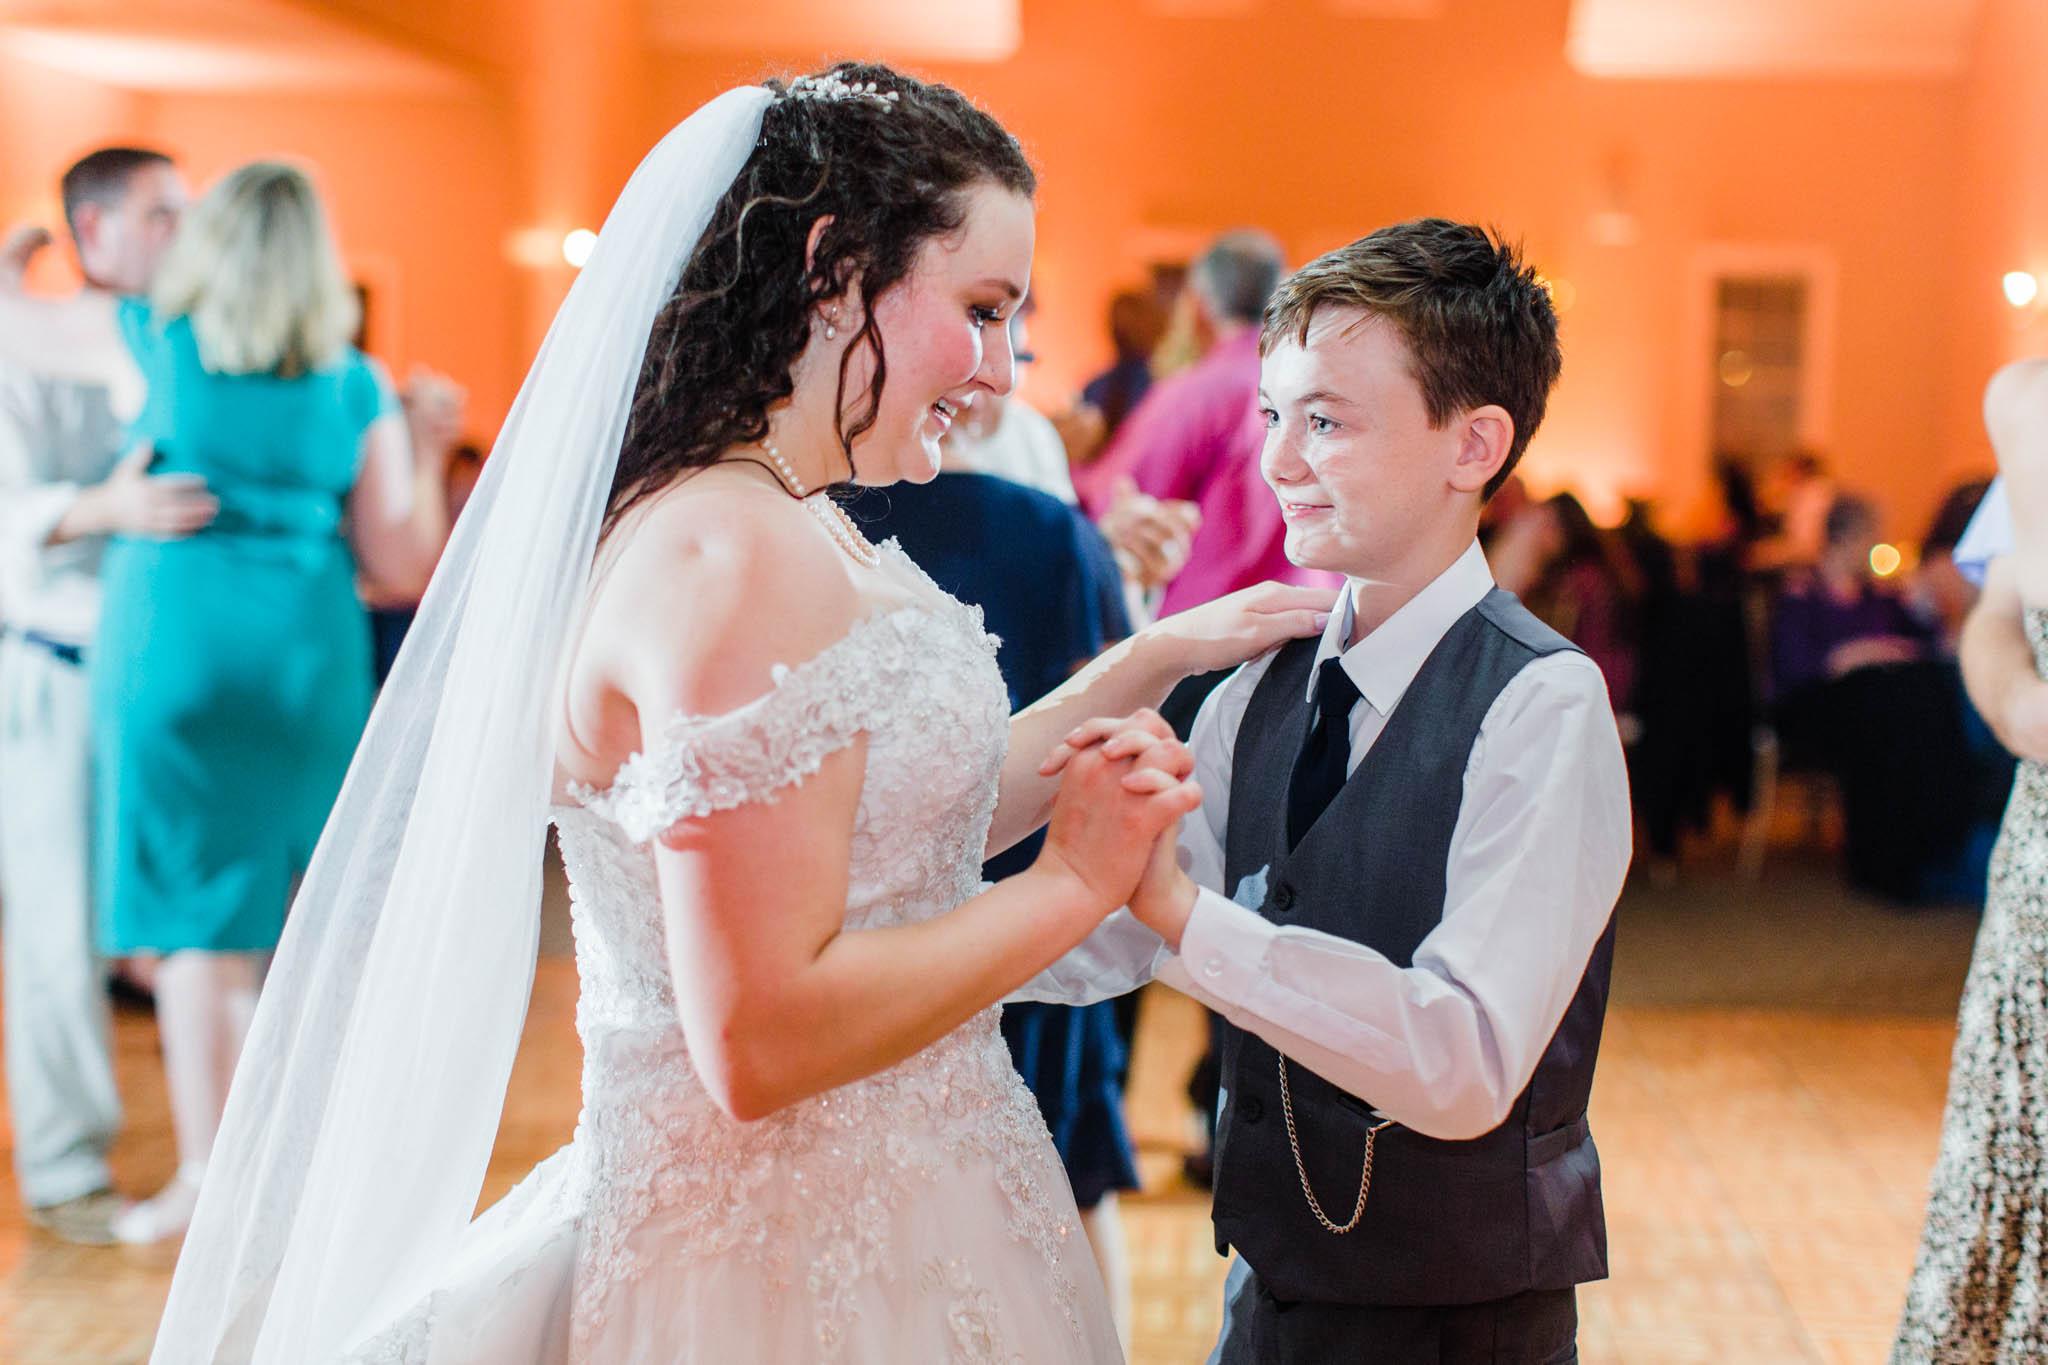 lynchburg-virginia-wedding-photographer-187.jpg